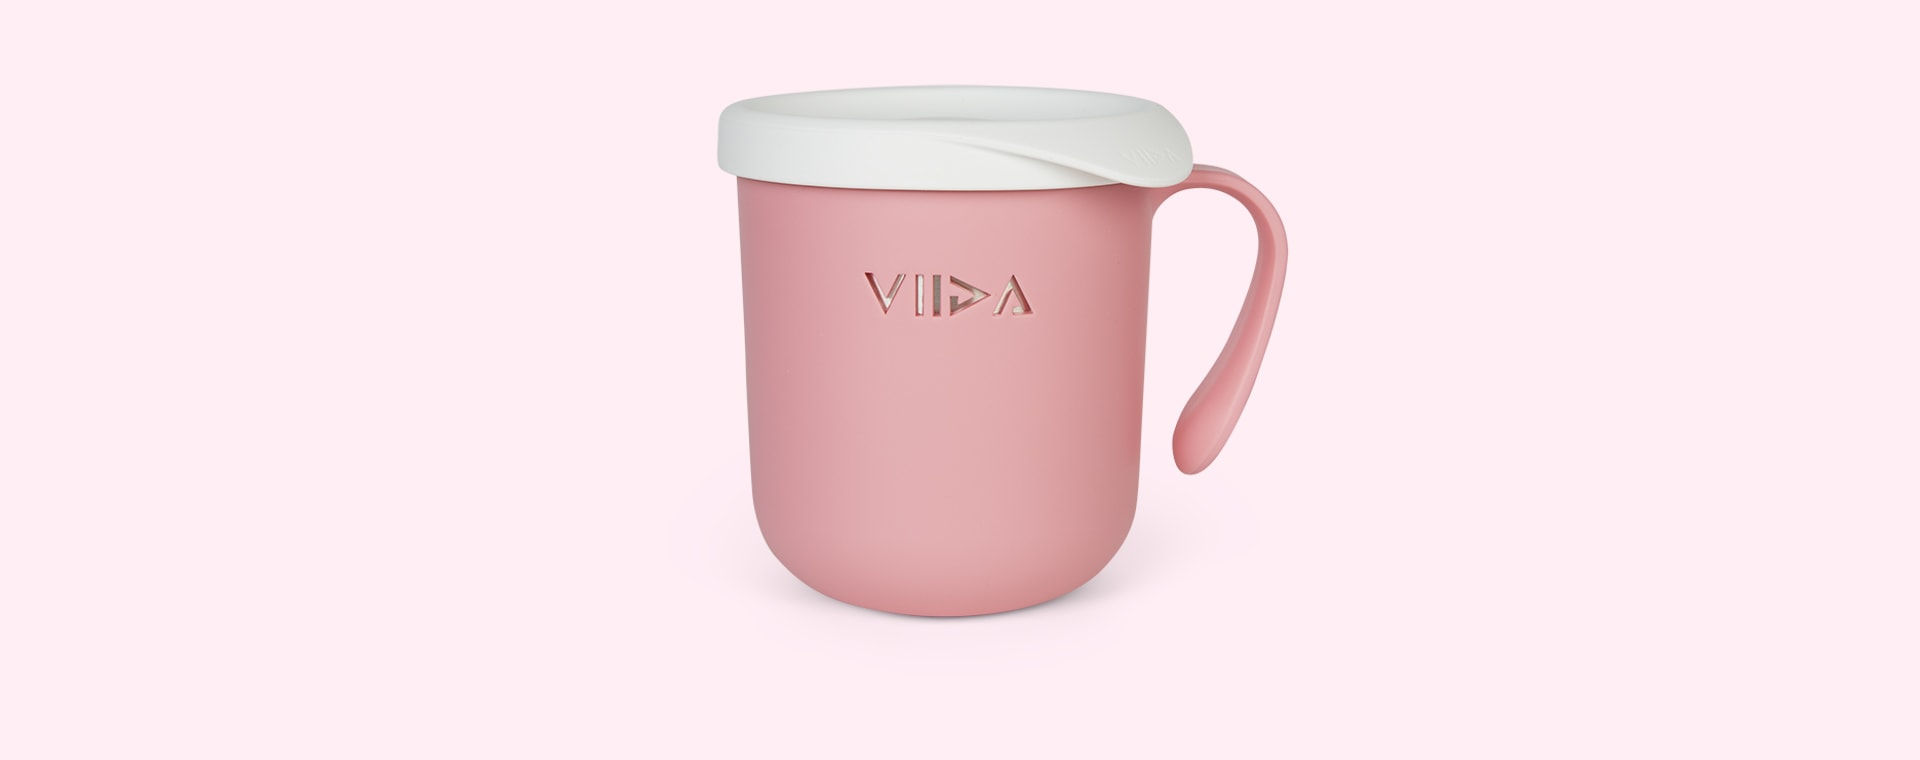 Taffy Pink VIIDA Soufflé Antibacterial Stainless Steel Cup